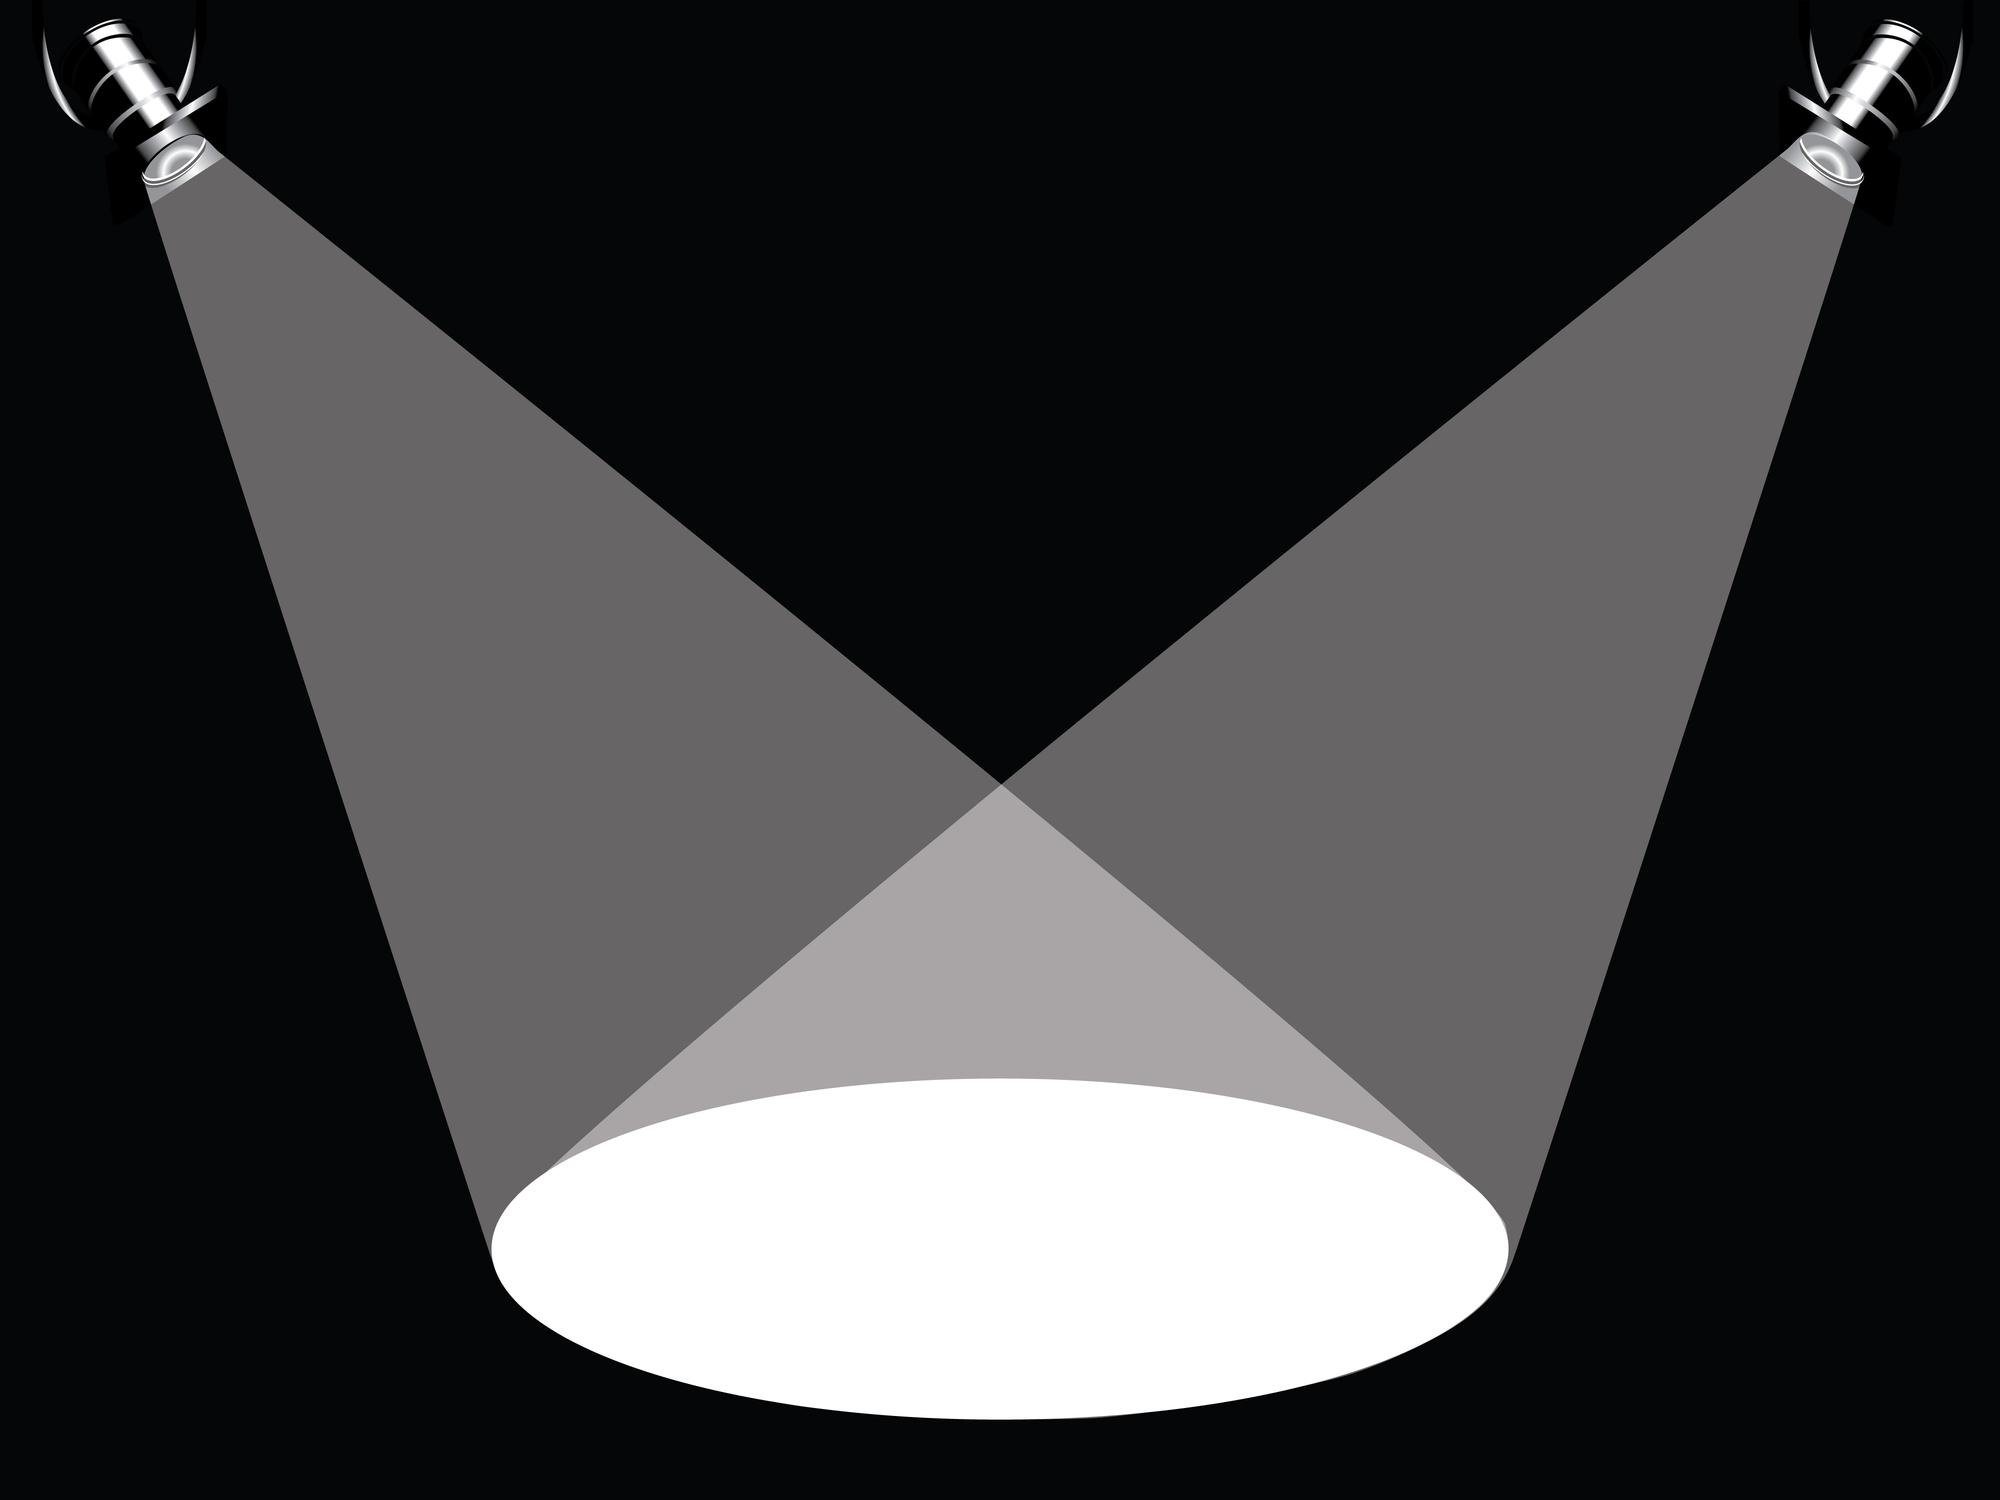 Spotlight Black And White Clipart Suggest, Floor Clip Art.